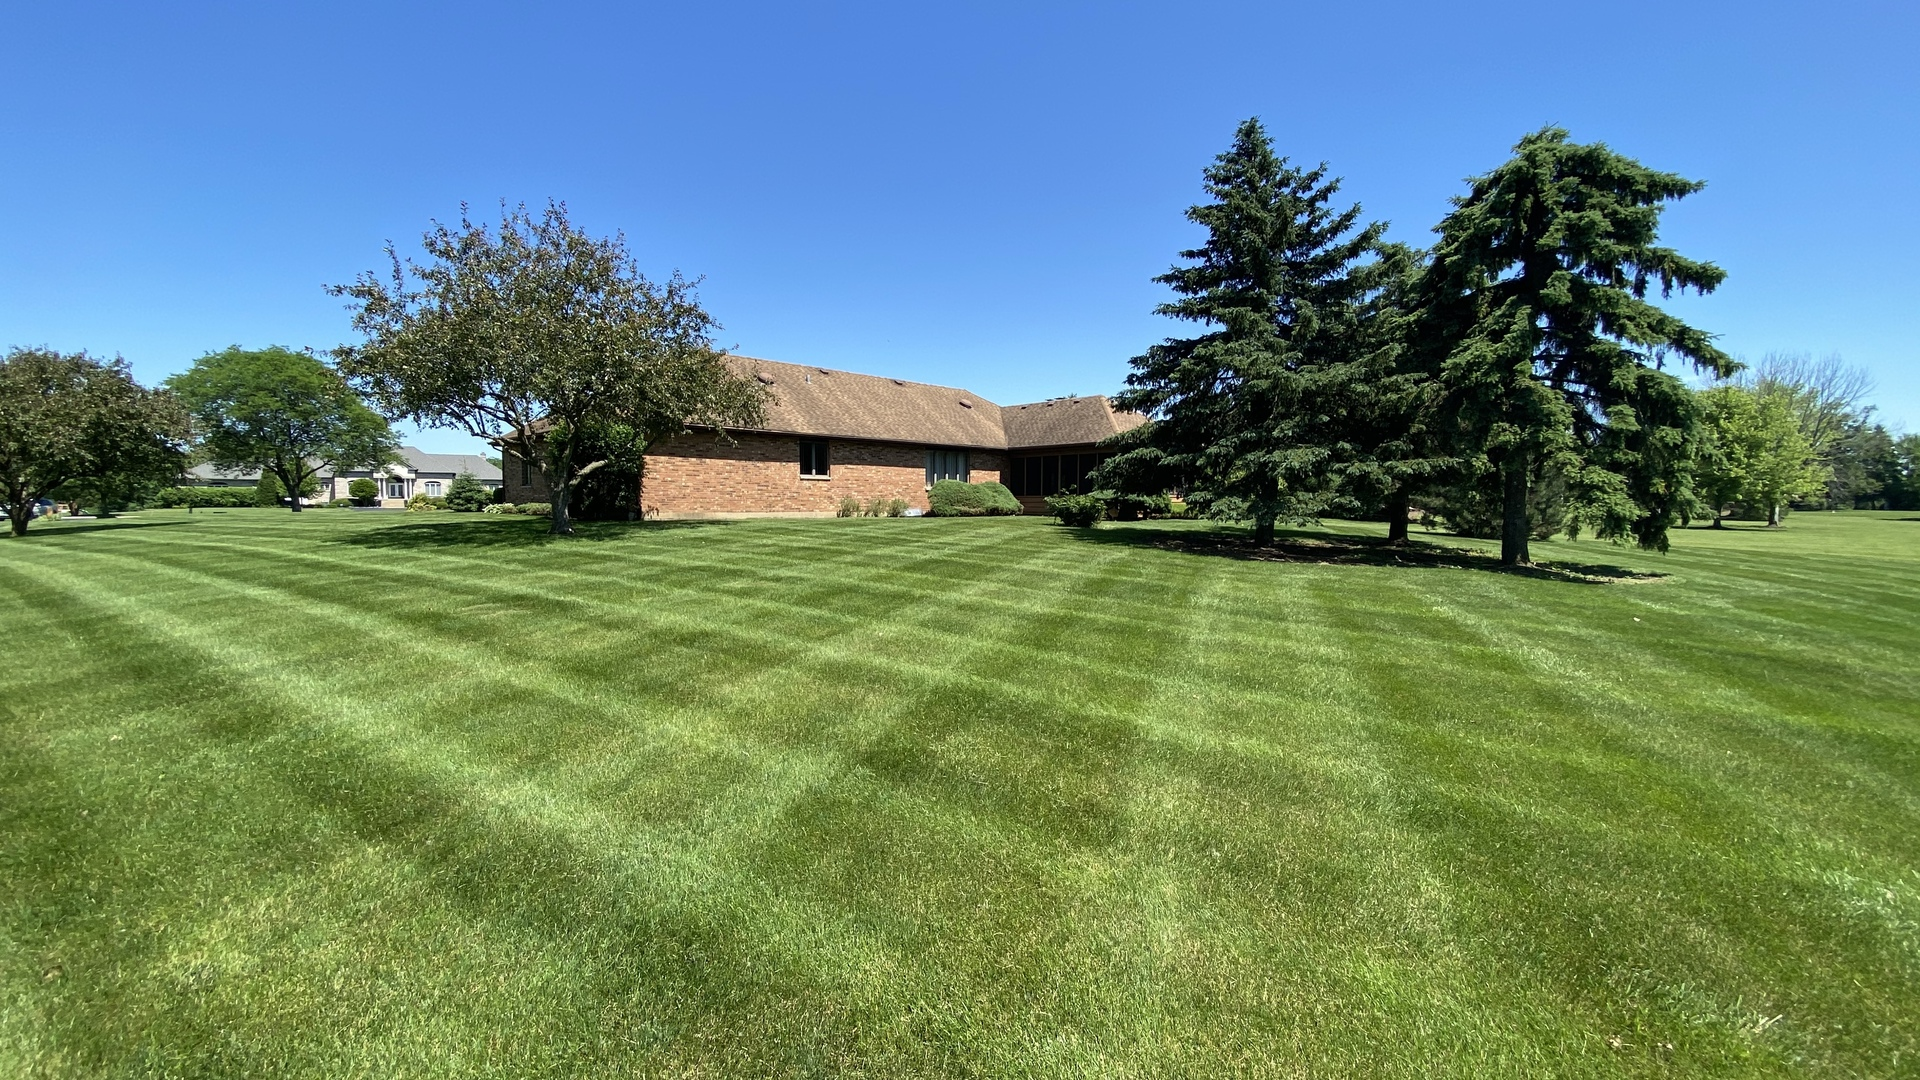 18 Revere, South Barrington, Illinois, 60010